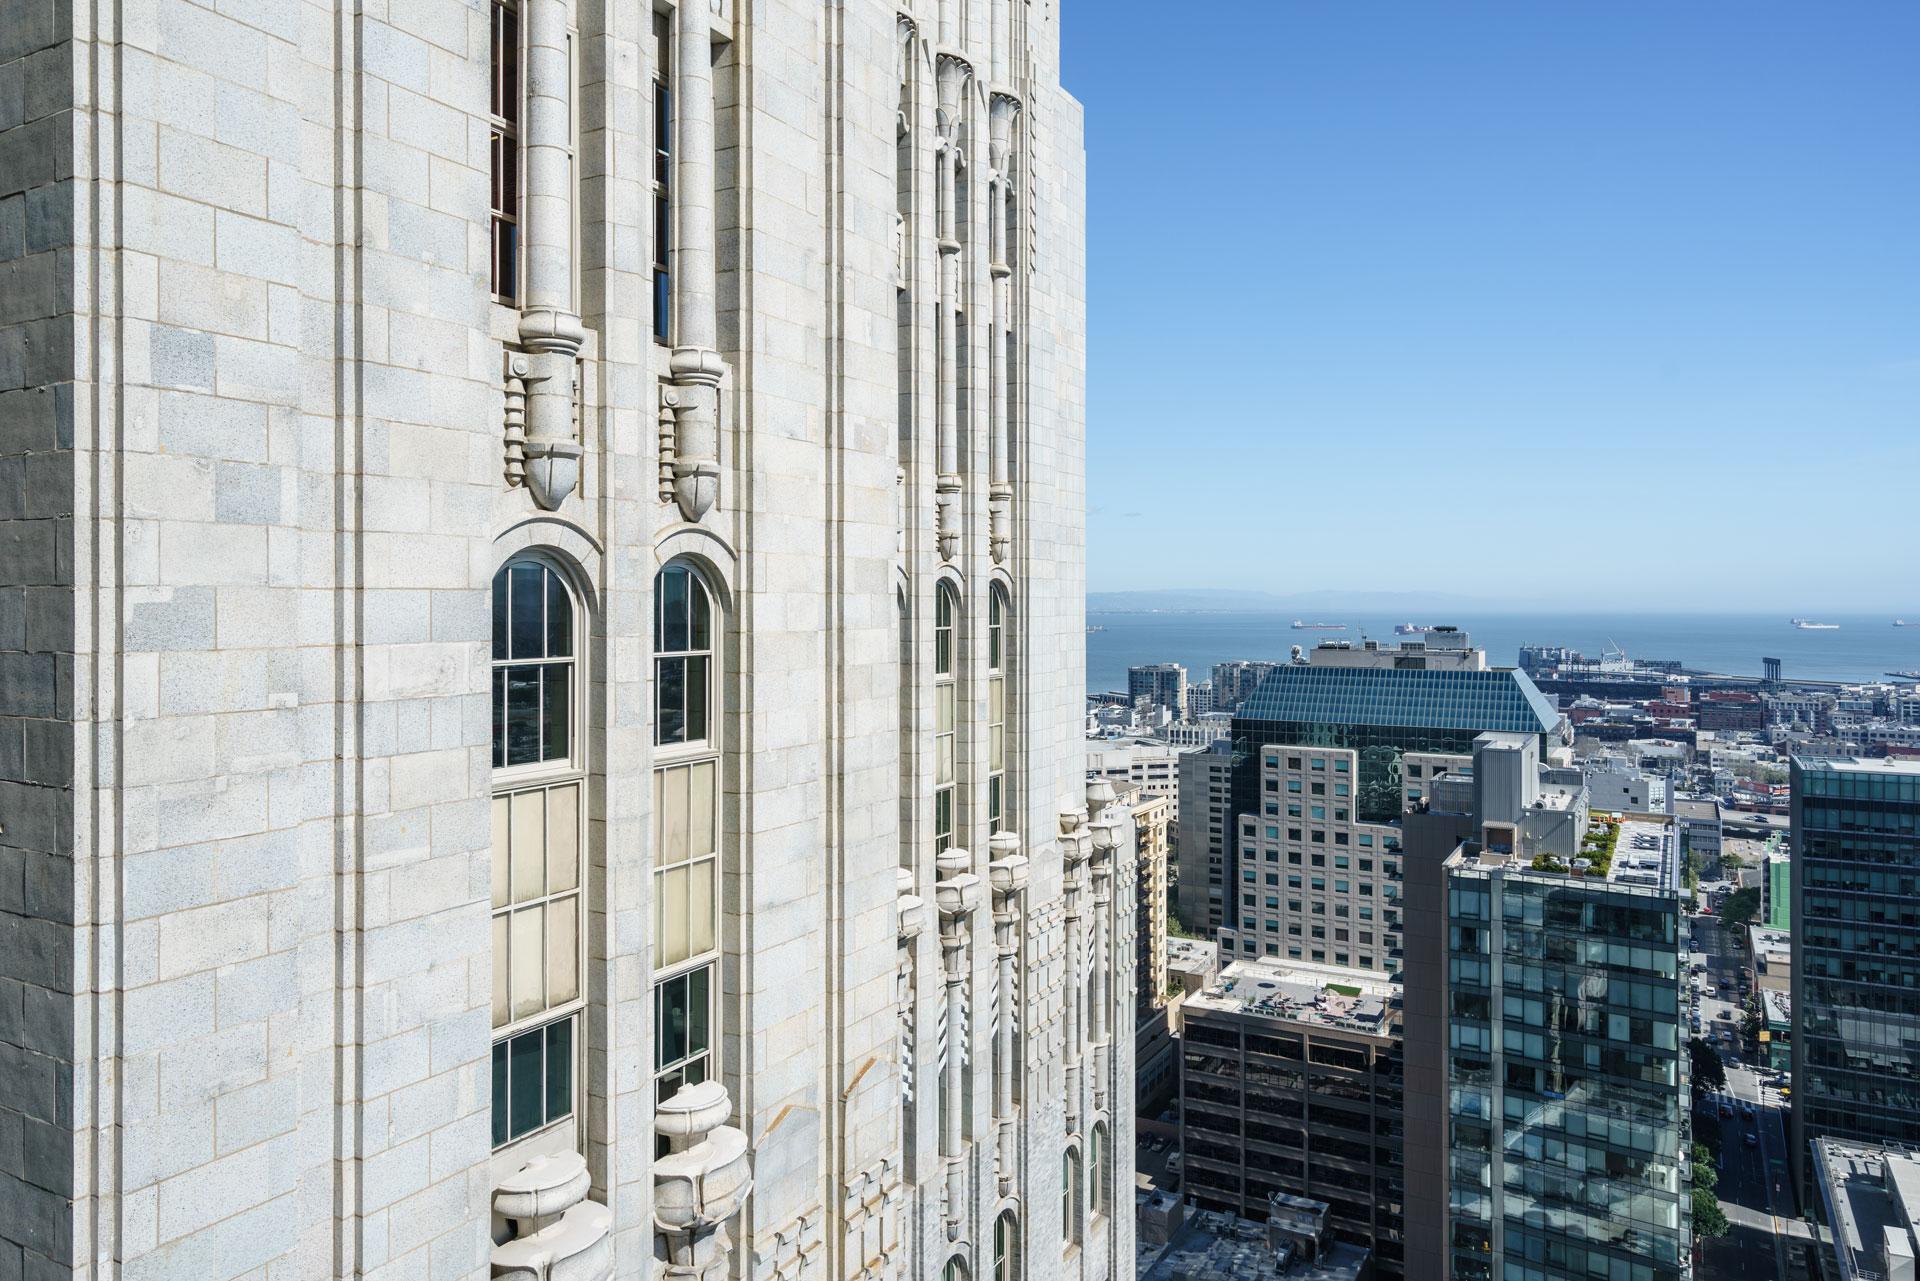 140 New Montgomery 2 story window, no arch